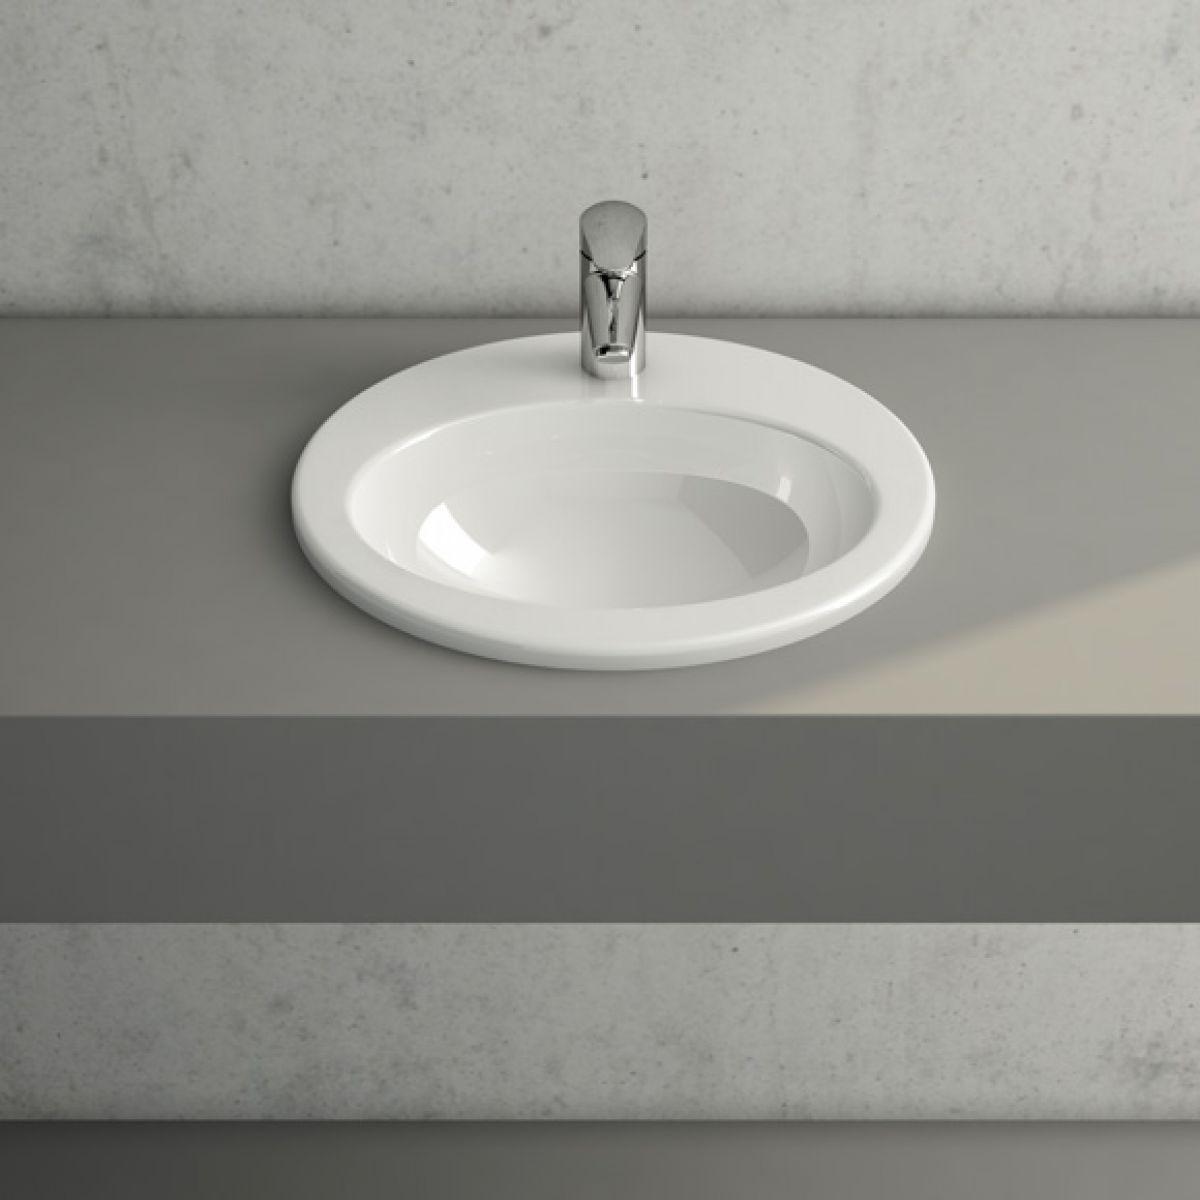 vitra s20 round countertop basin uk bathrooms. Black Bedroom Furniture Sets. Home Design Ideas